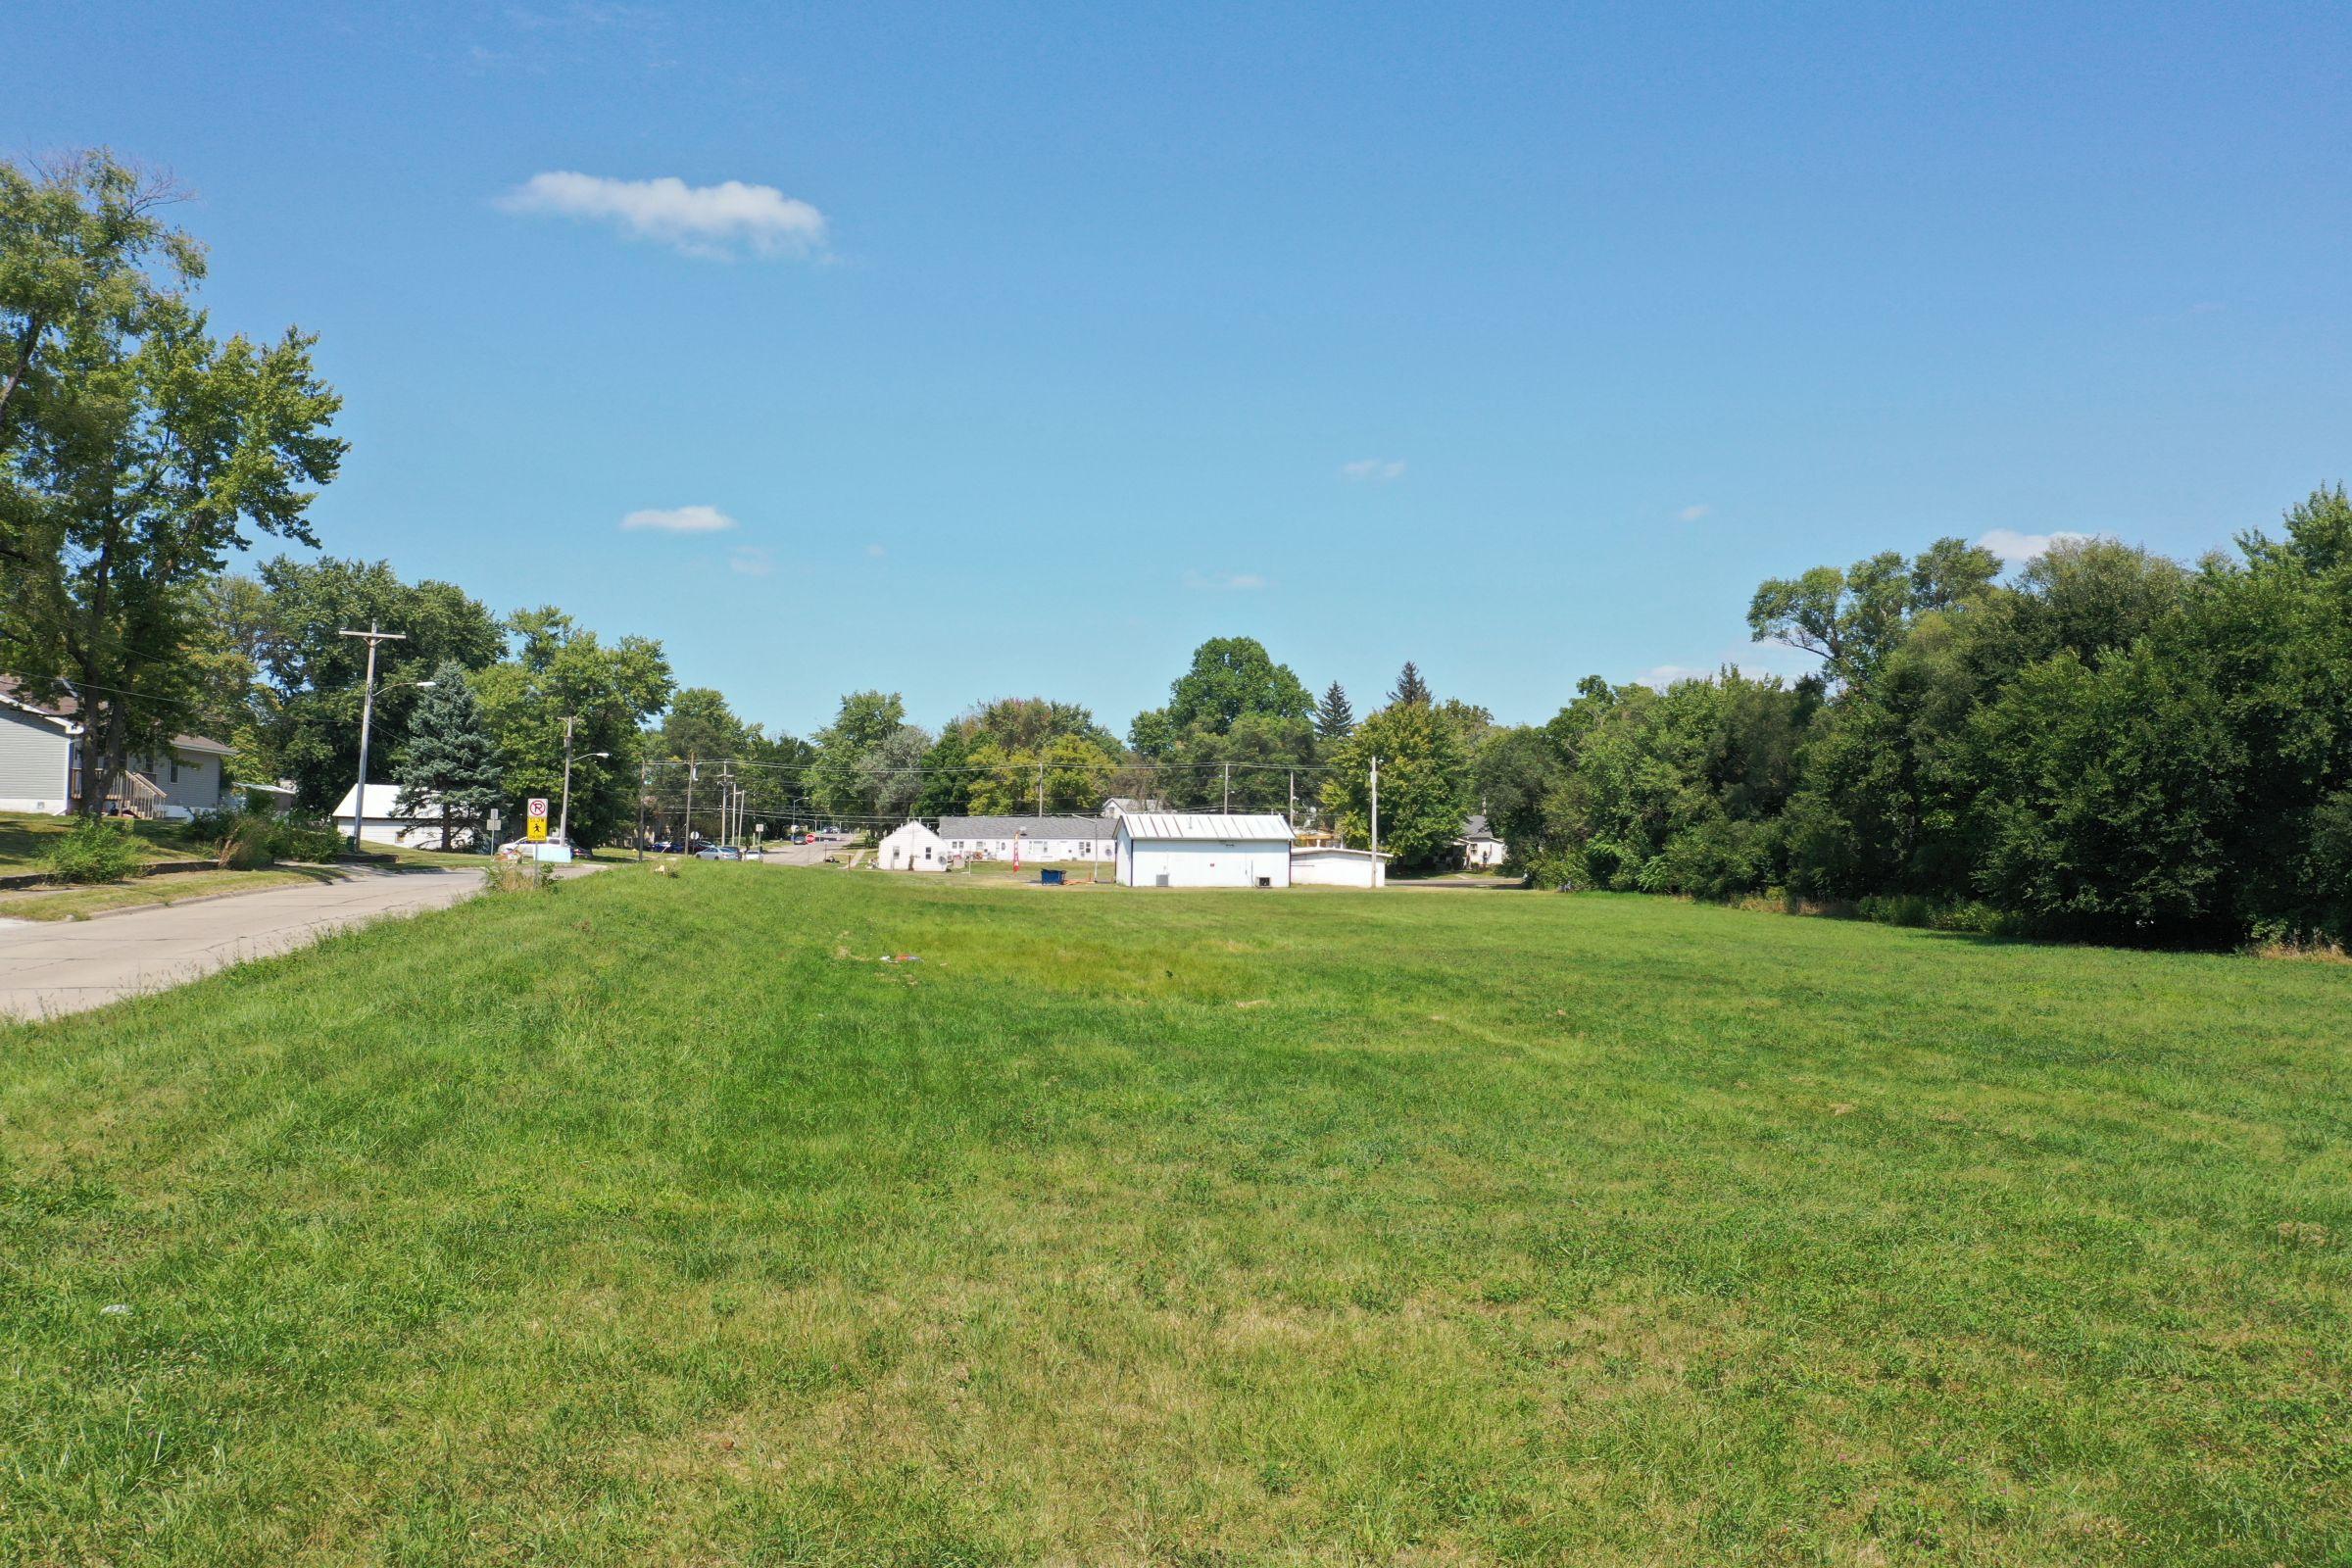 land-warren-county-iowa-2-acres-listing-number-15121-5-2020-09-01-190455.jpg